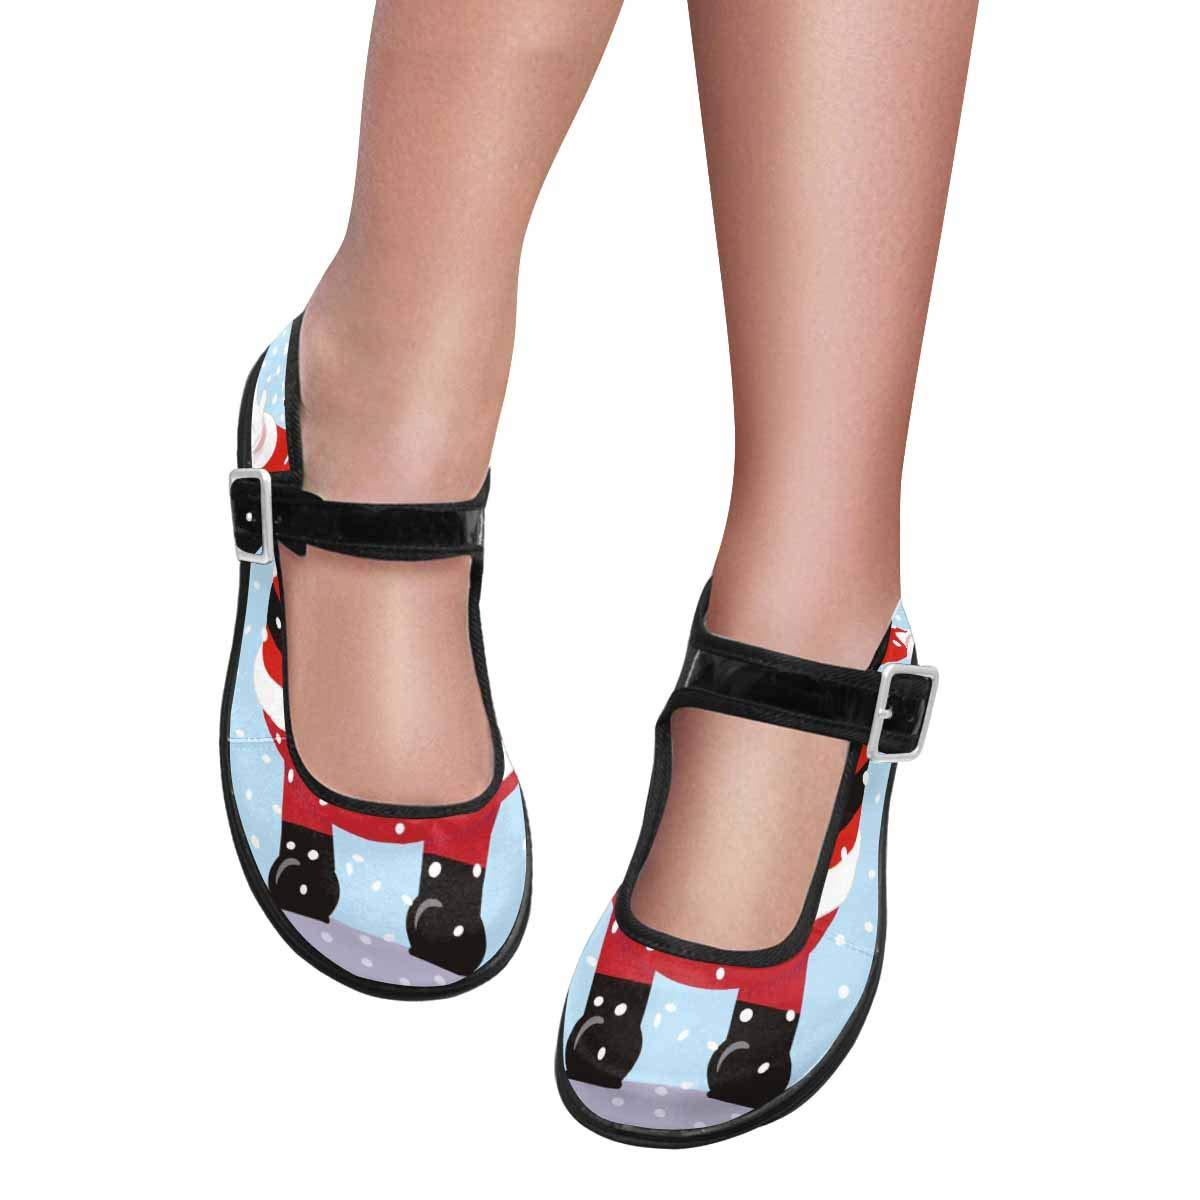 INTERESTPRINT Womens Satin Mary Jane Flats Ballet Shoes Santa Claus Welcoming Christmas